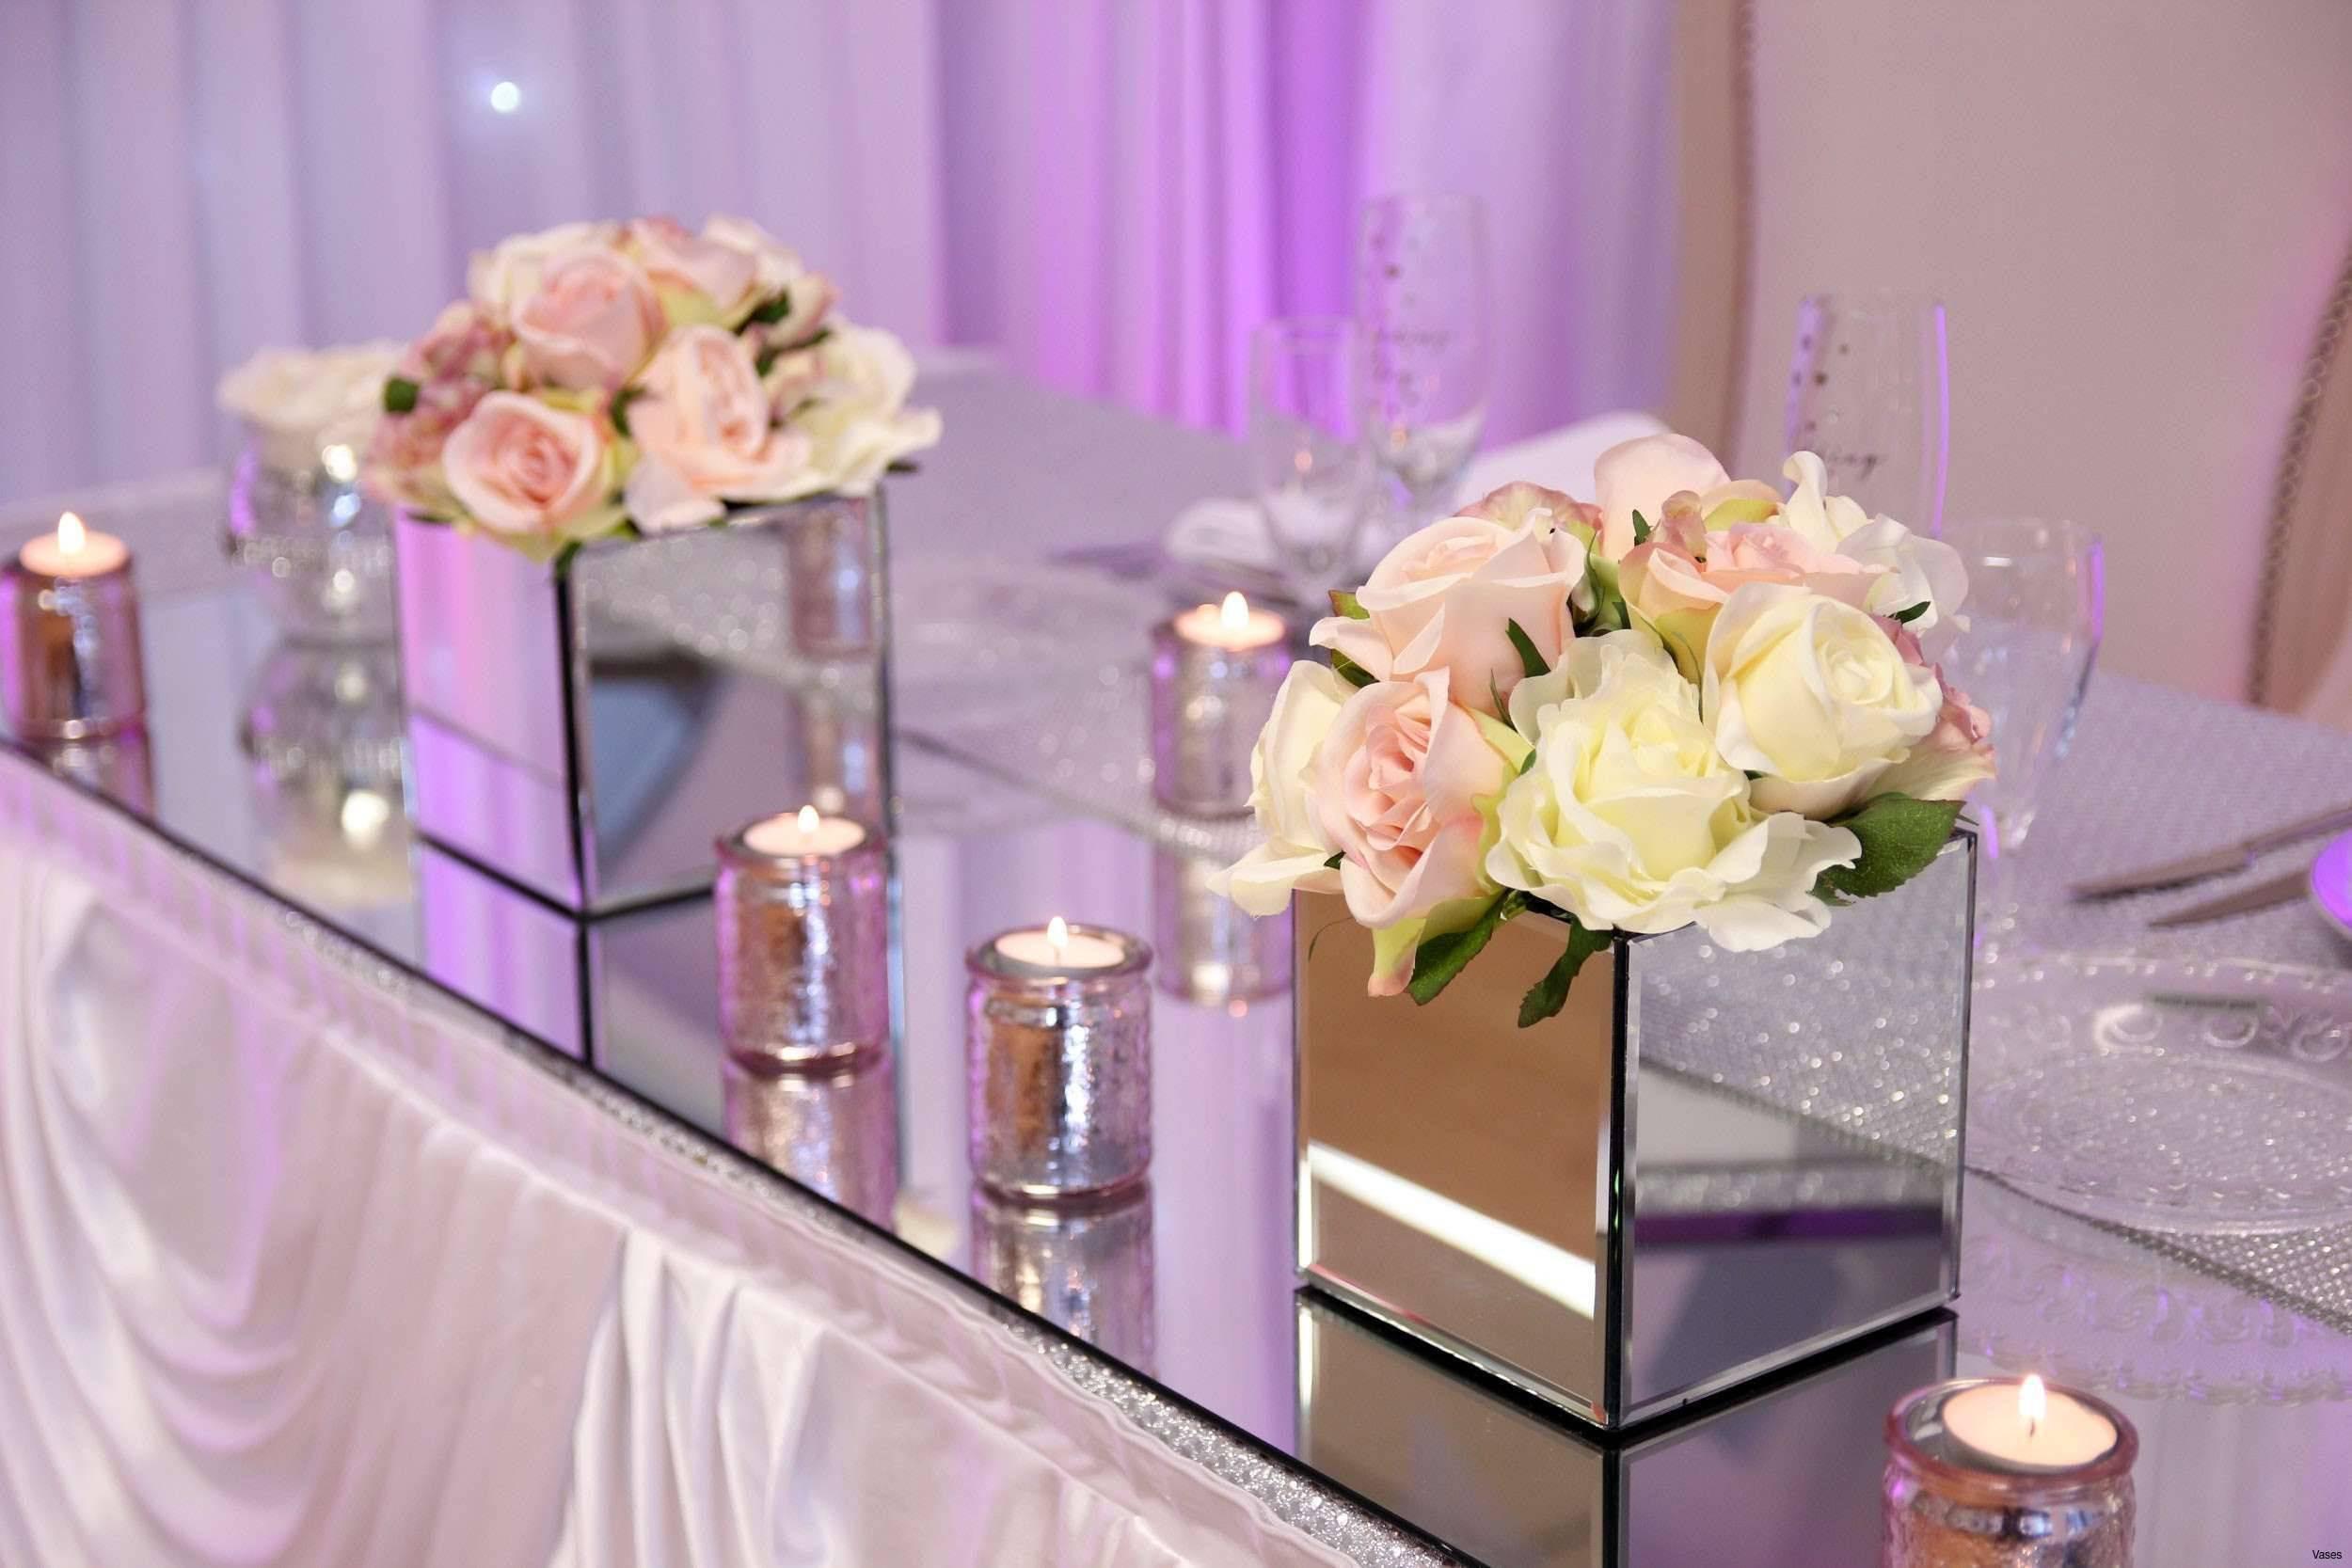 vase lights of mirrored square vase 3h vases mirror table decorationi 0d weddings inside mirrored square vase 3h vases mirror table decorationi 0d weddings inspiration of outdoor halloween lights